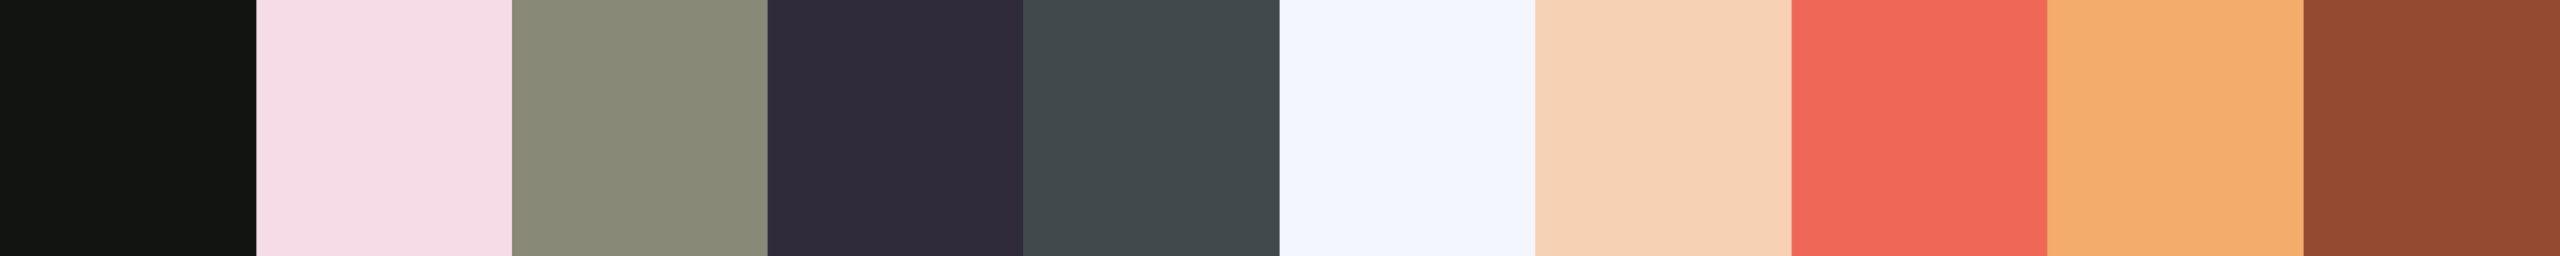 206 Zoquillera Color Palette